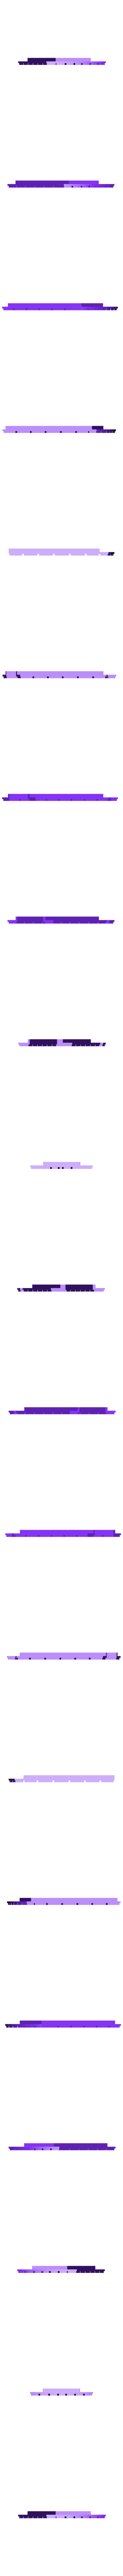 Encadrement de porte.STL Download STL file Station 3 Doors PLM Coursan • 3D print model, dede34500